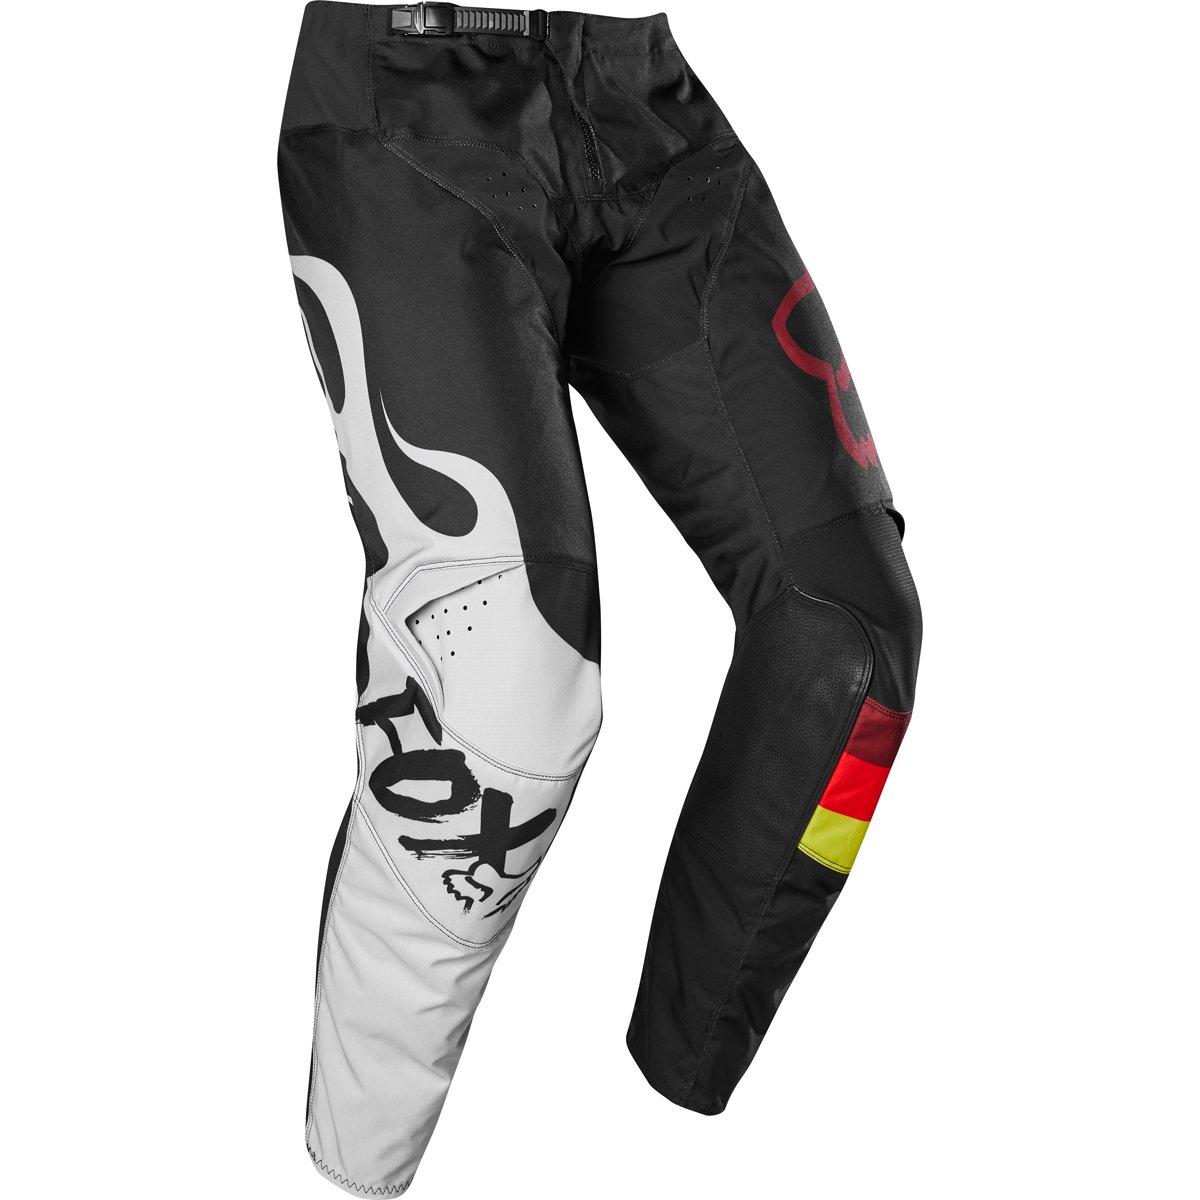 Fox Racing 180 Rodka SE Men's MX Motorcycle Pants - Black / 28